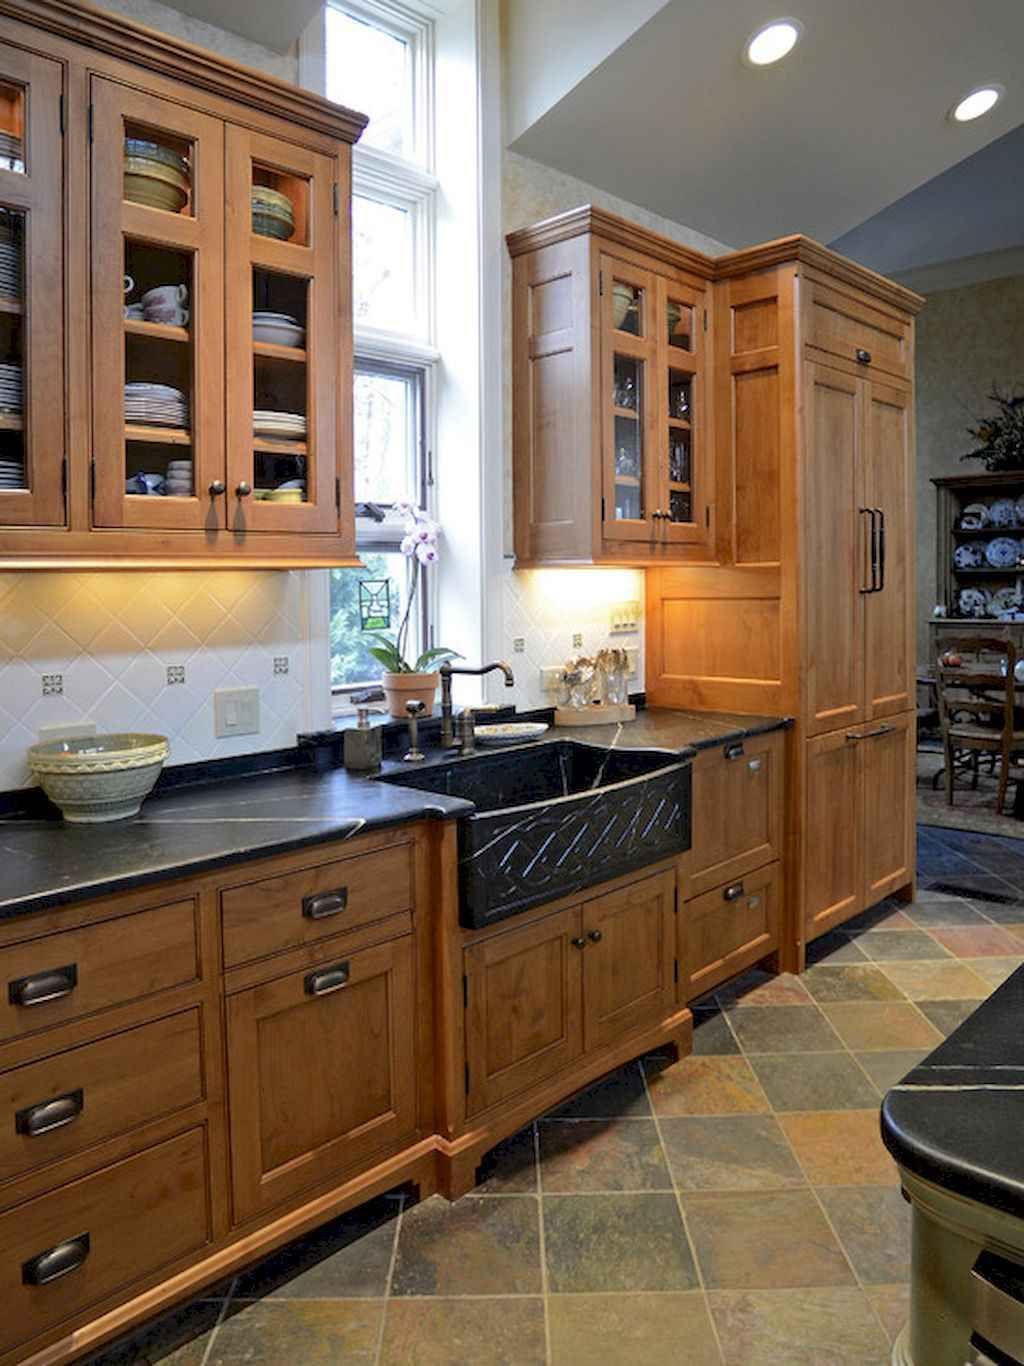 90 Rustic Kitchen Cabinets Farmhouse Style Ideas 46 Livingmarch Com Rustic Kitchen Cabinets Farmhouse Style Kitchen Cabinets Cottage Kitchen Cabinets